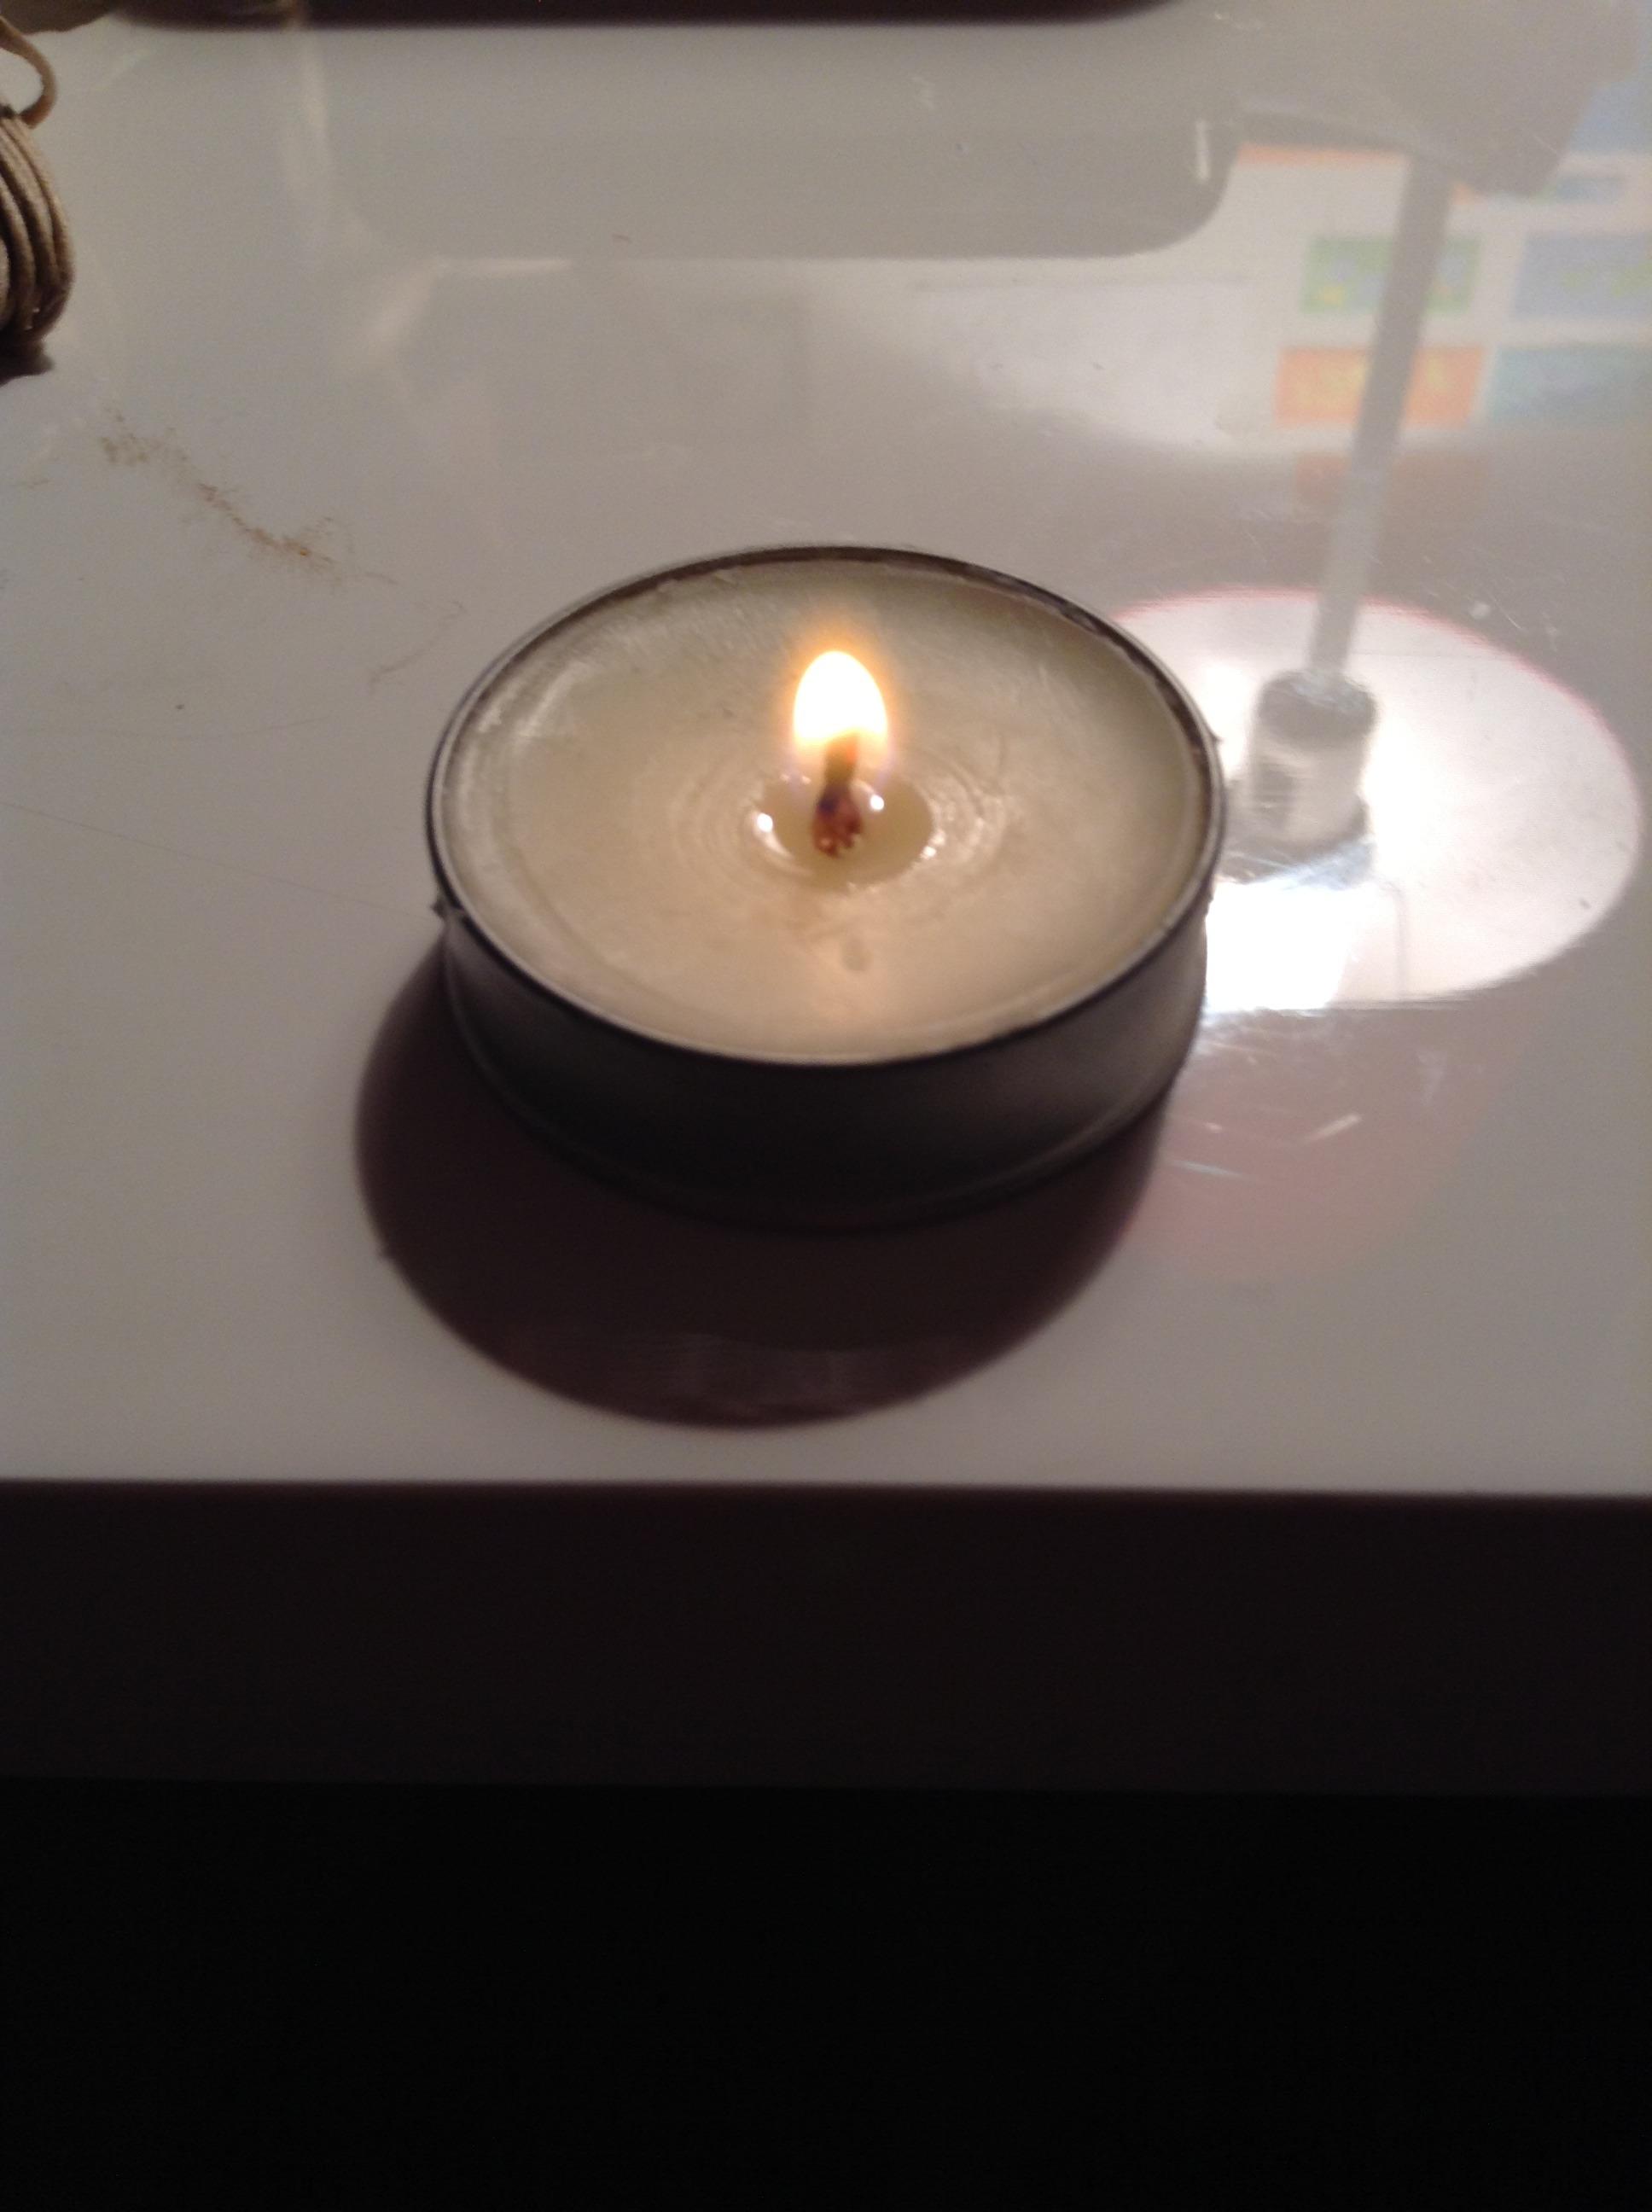 Emergency Lip Balm Candle